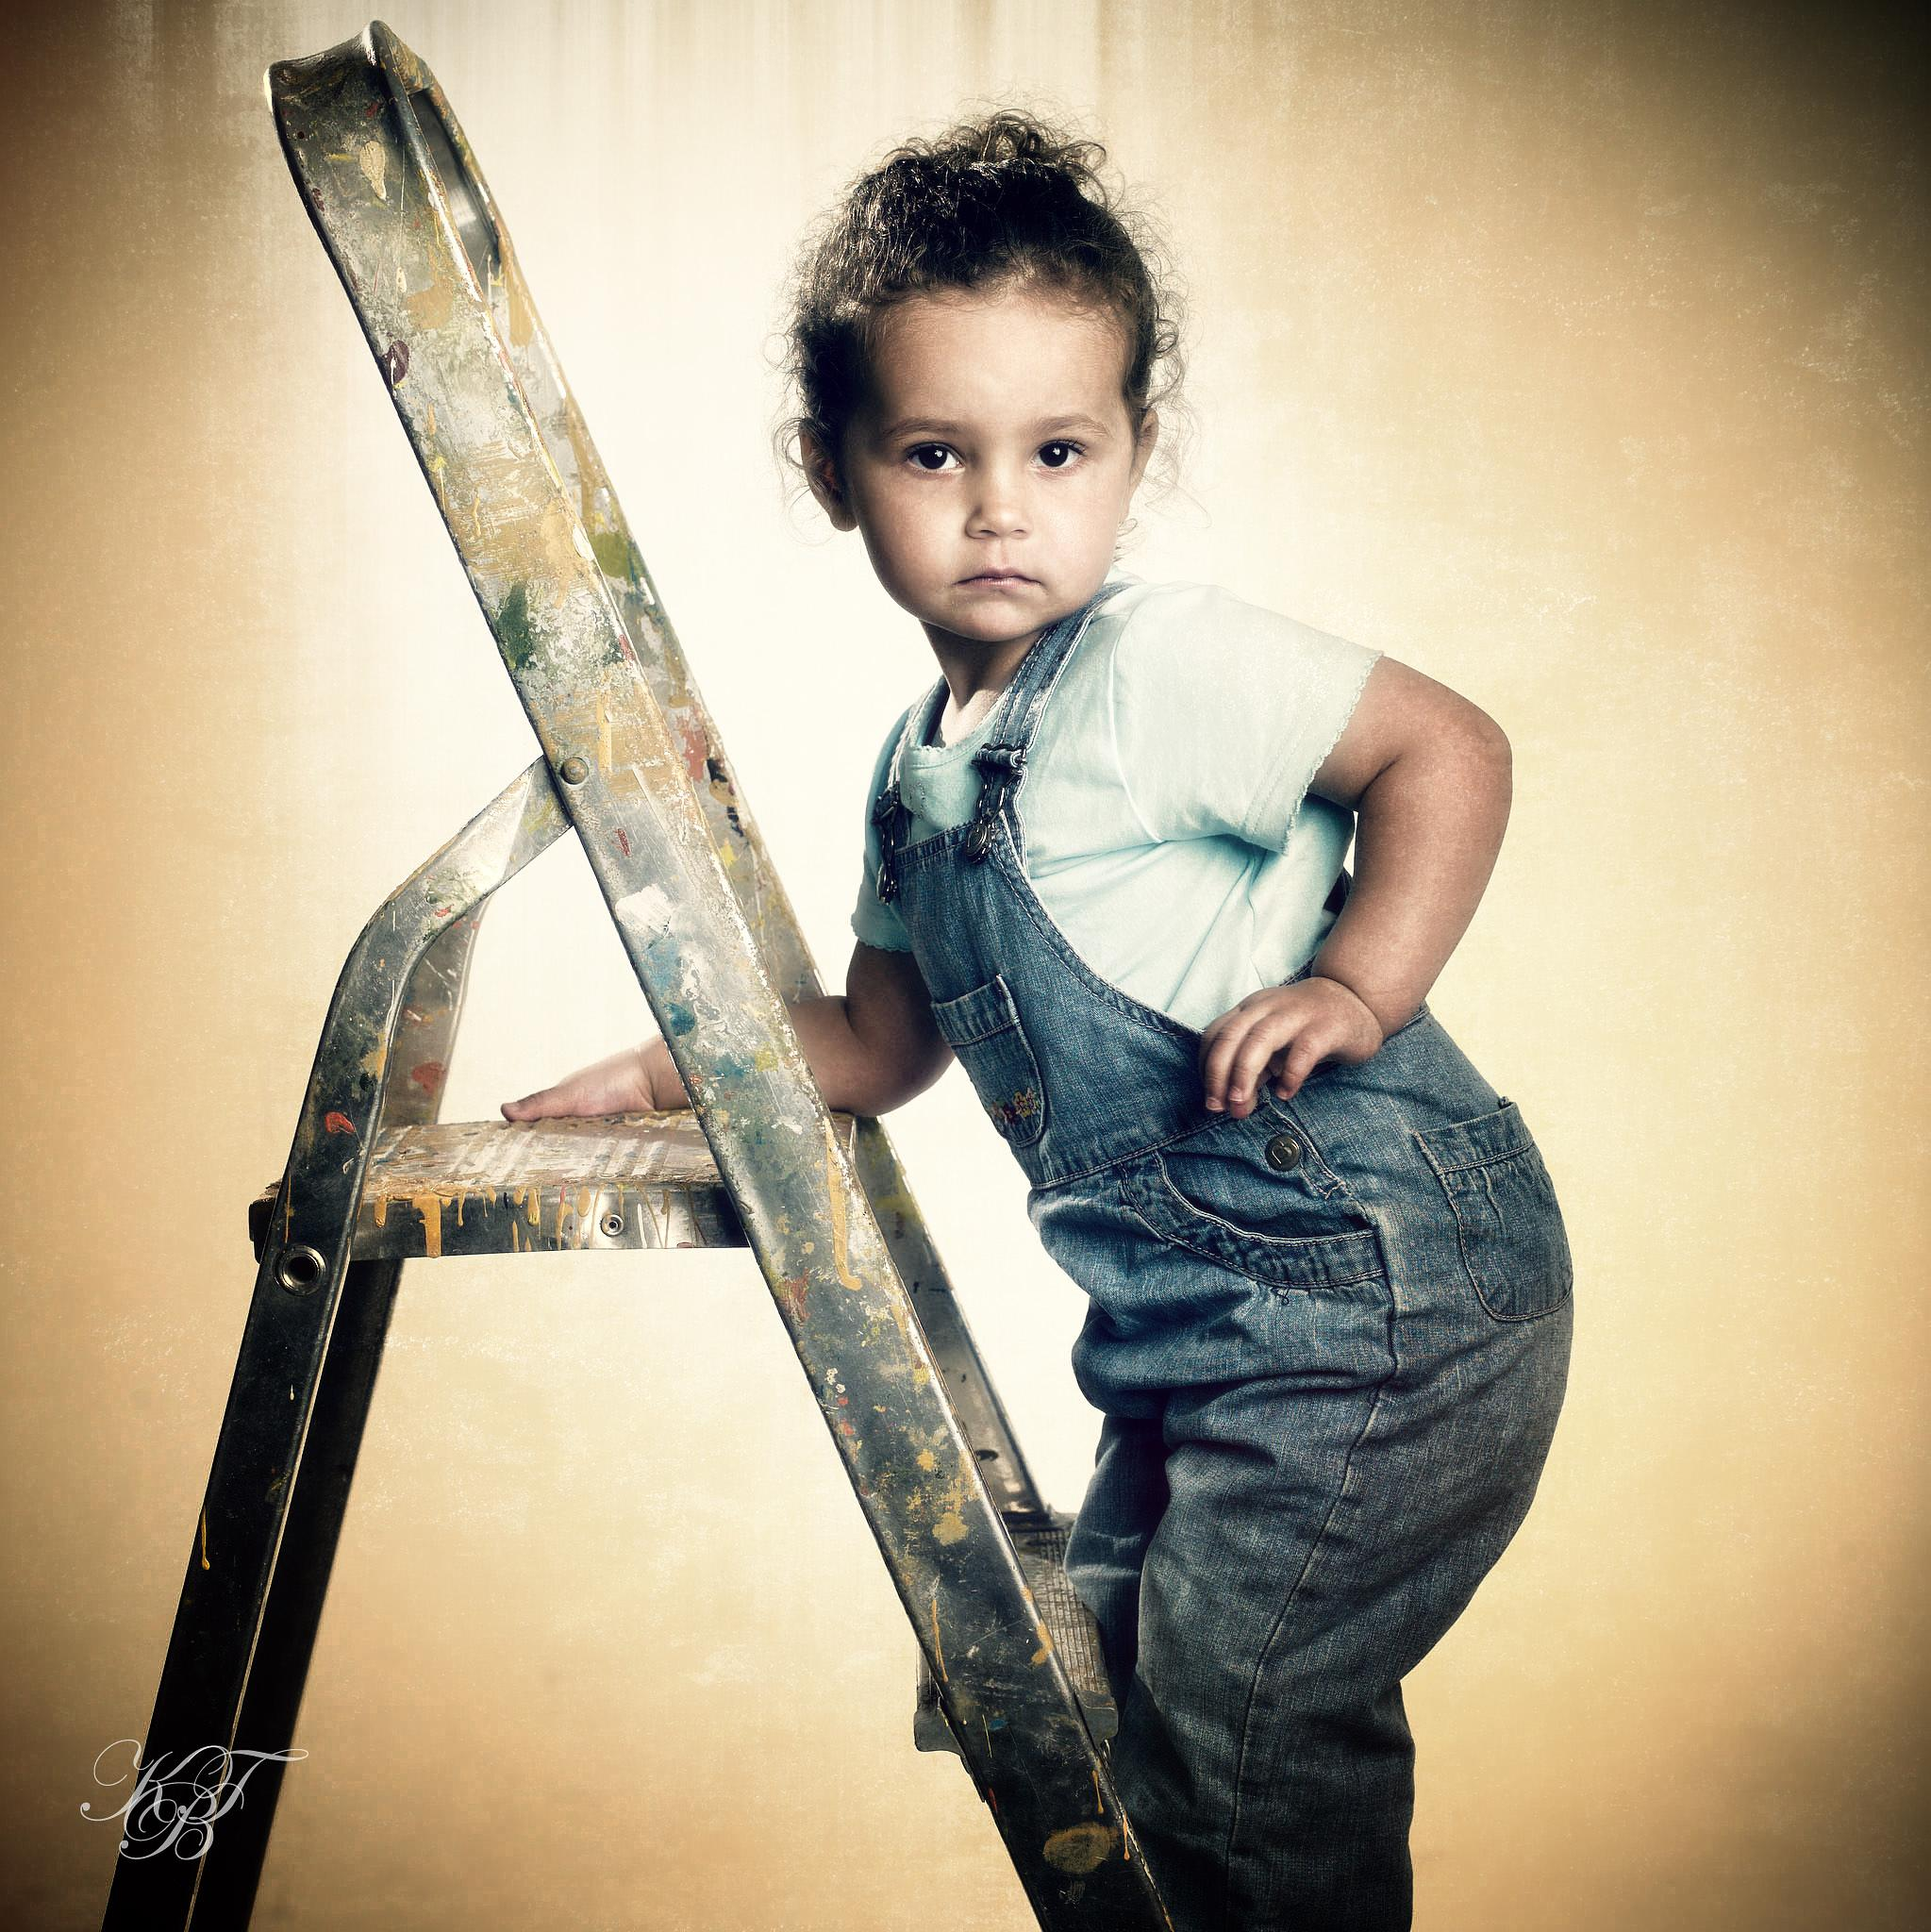 In a ladder by Pixforce